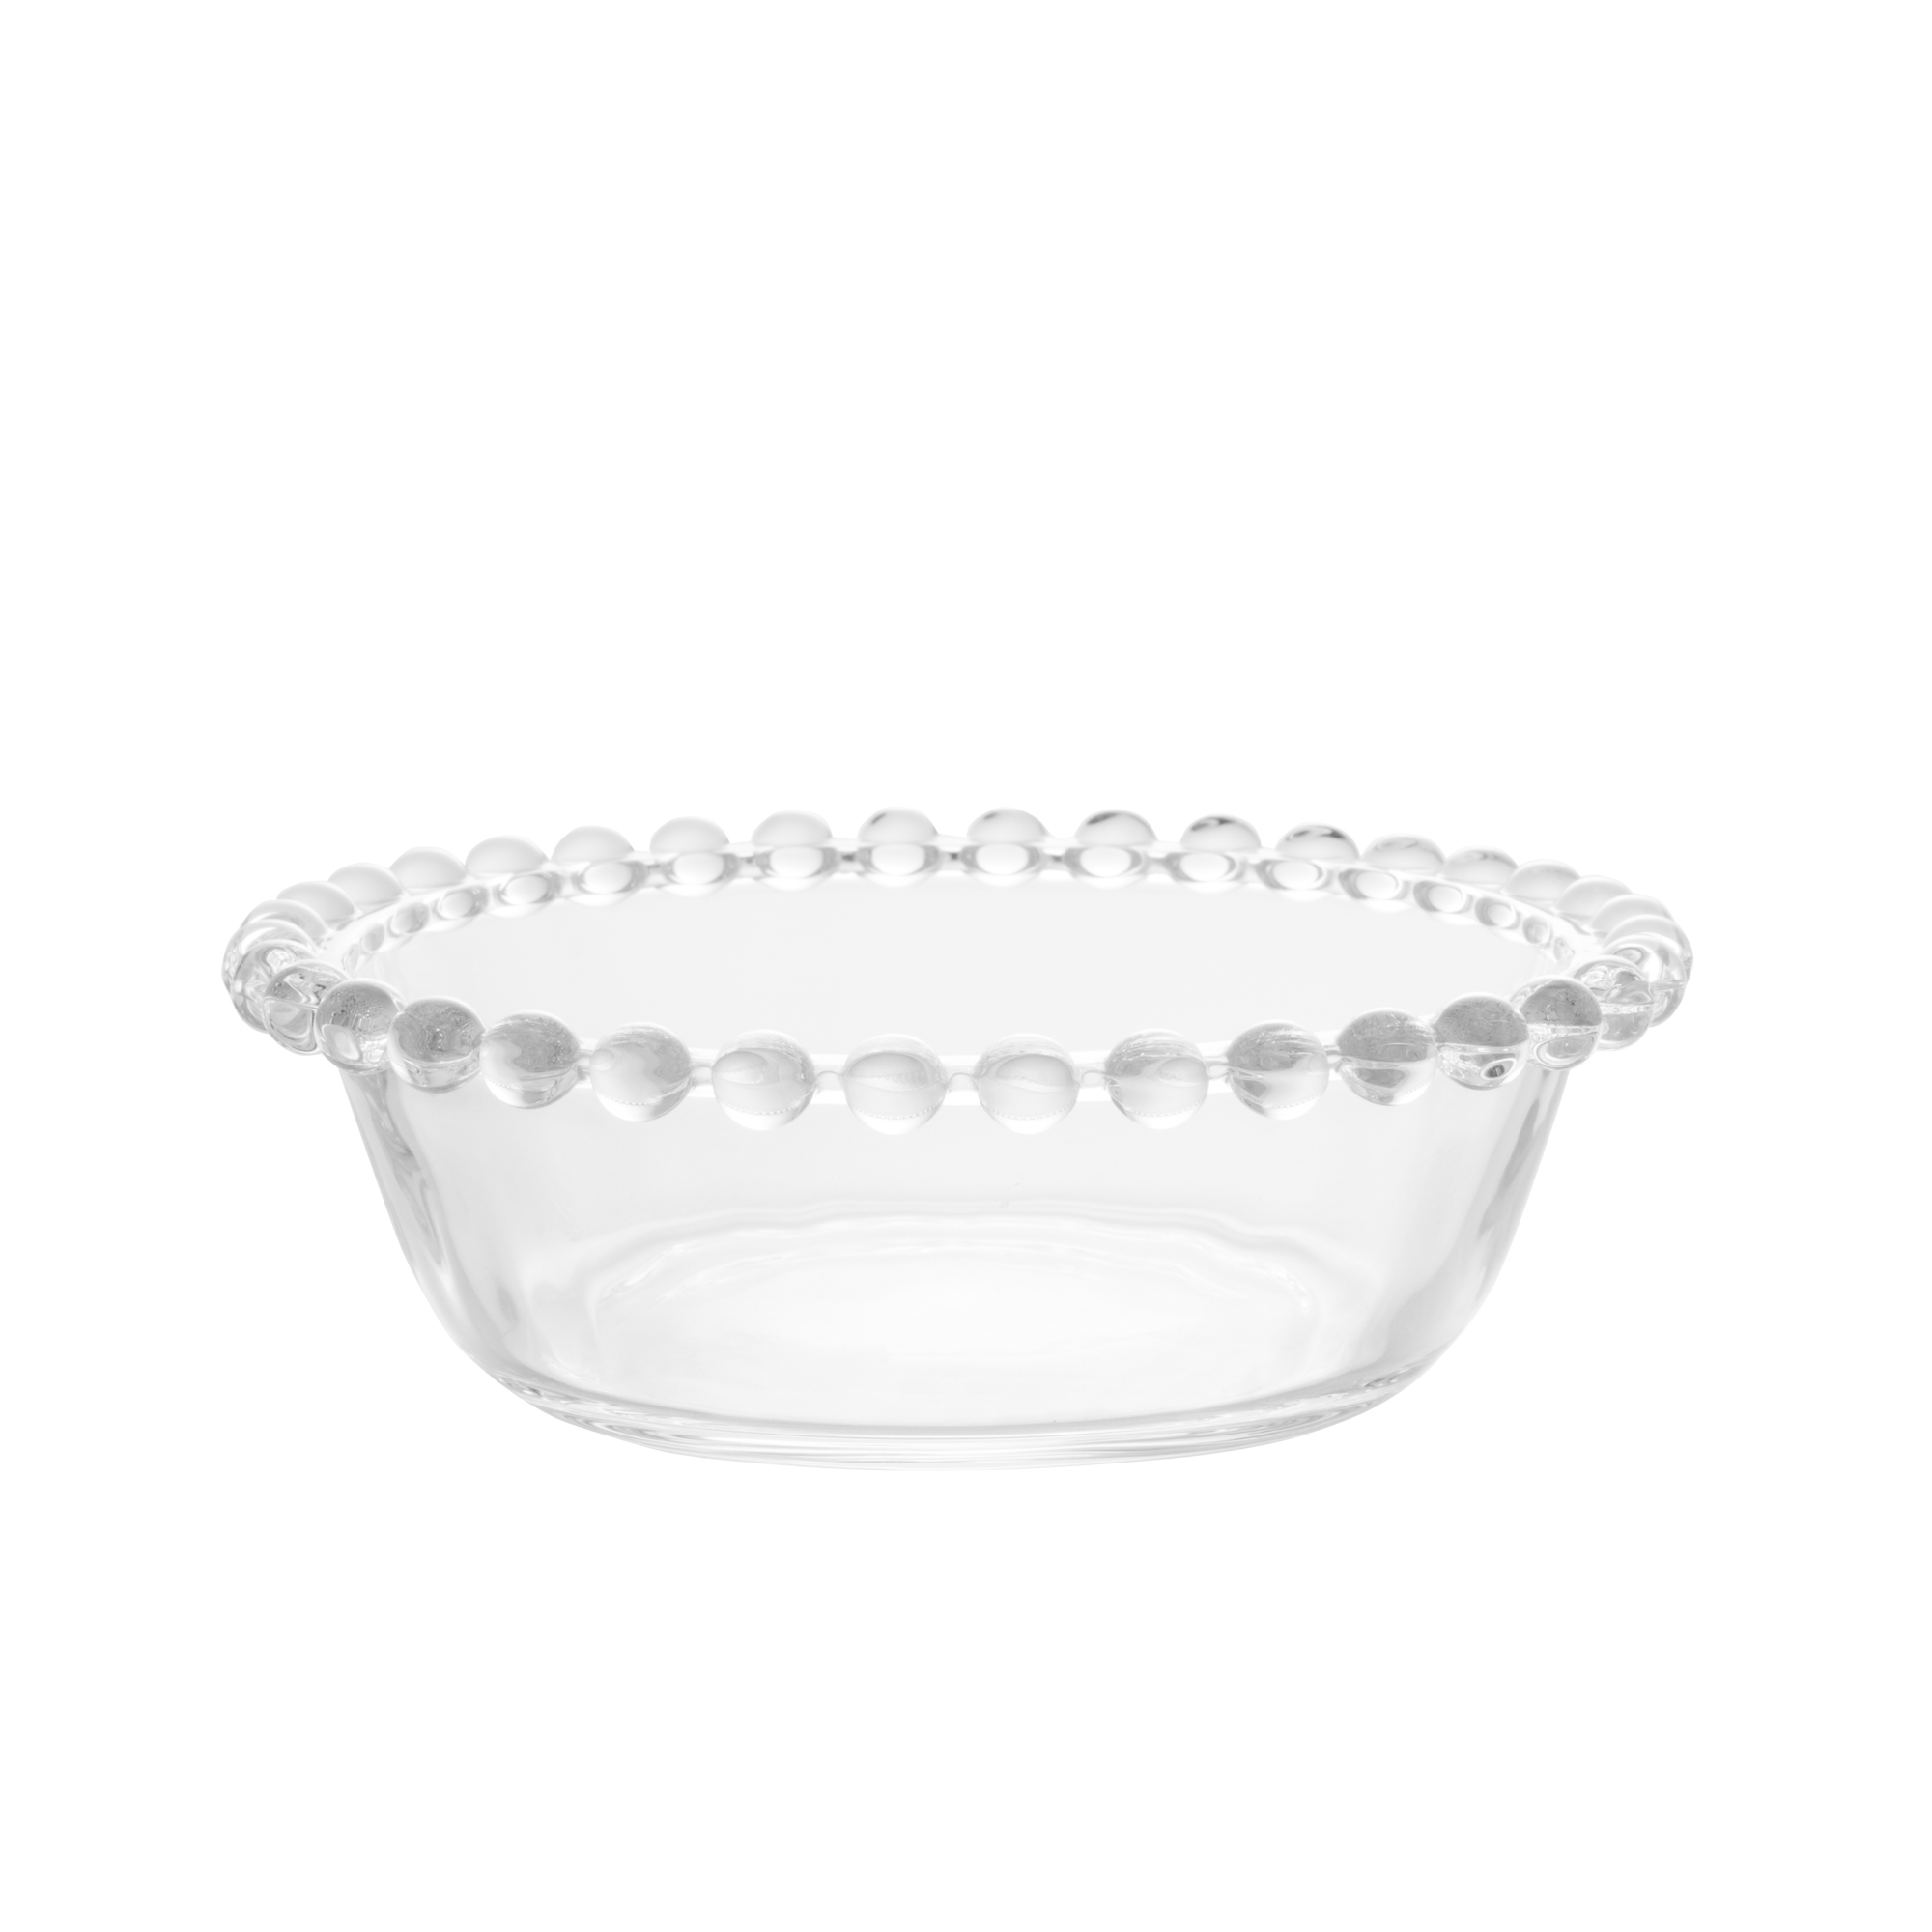 Jogo 3 bowls 14 cm para sobremesa de cristal transparente Pearl Wolff - 27893